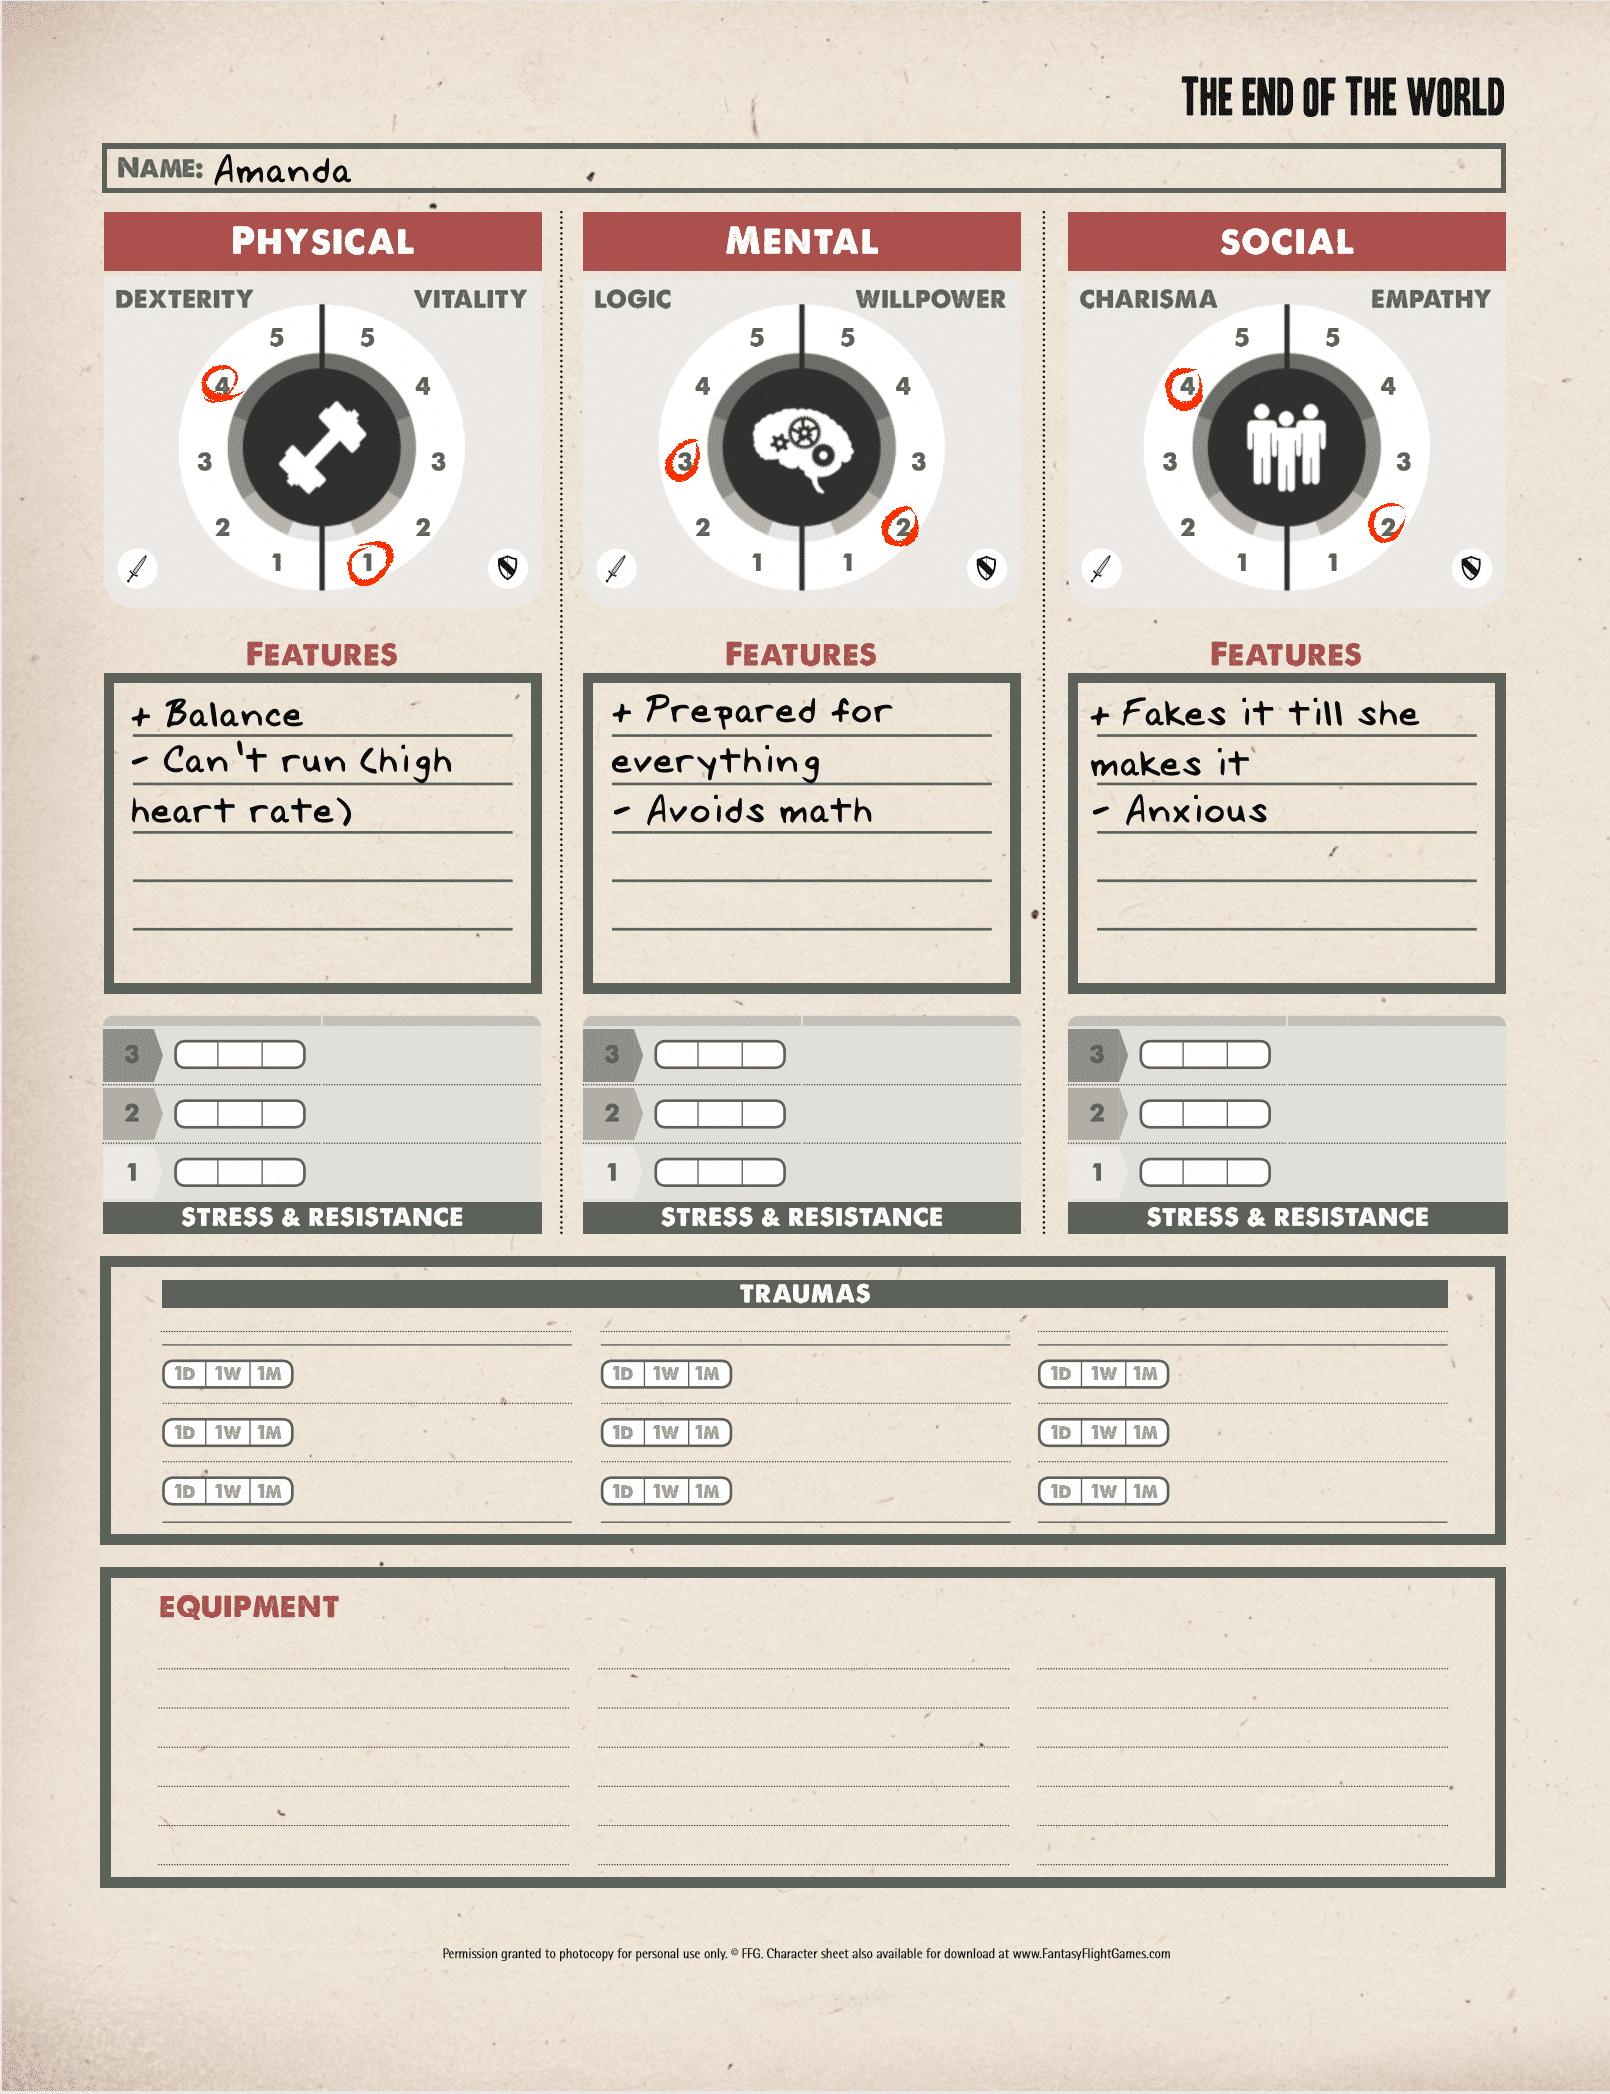 Character Sheet - Amanda